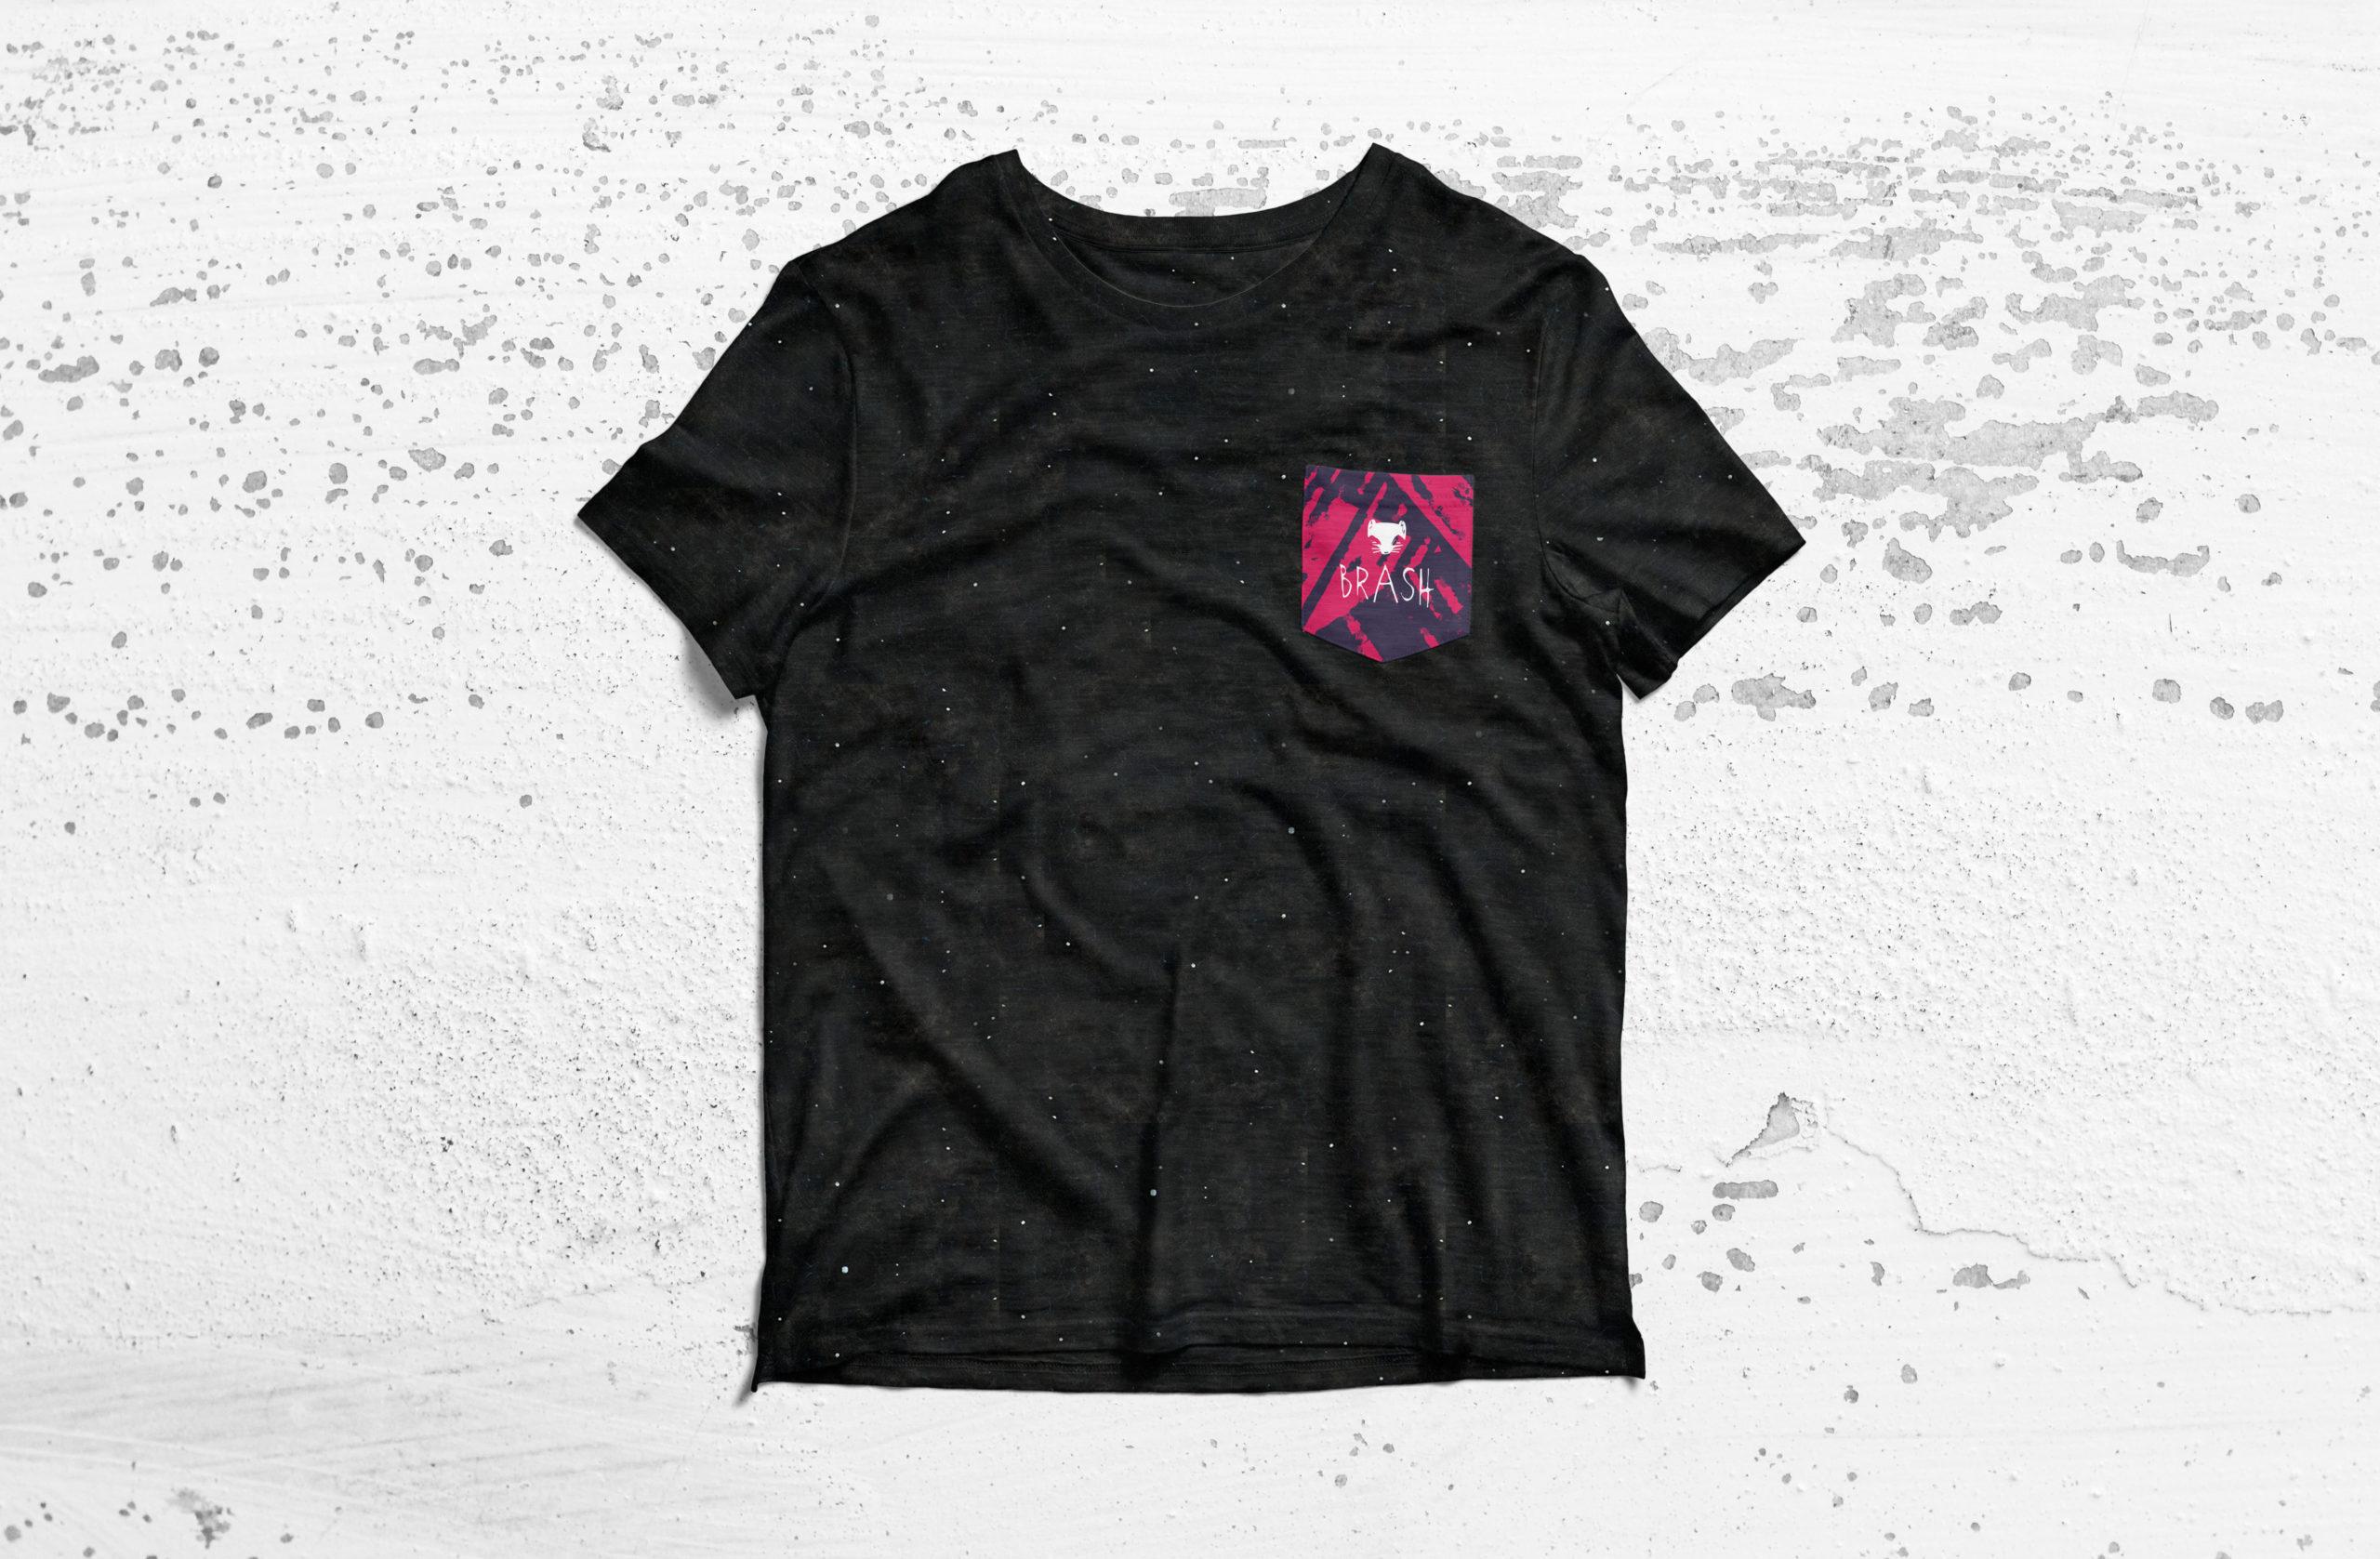 Front_Tshirt